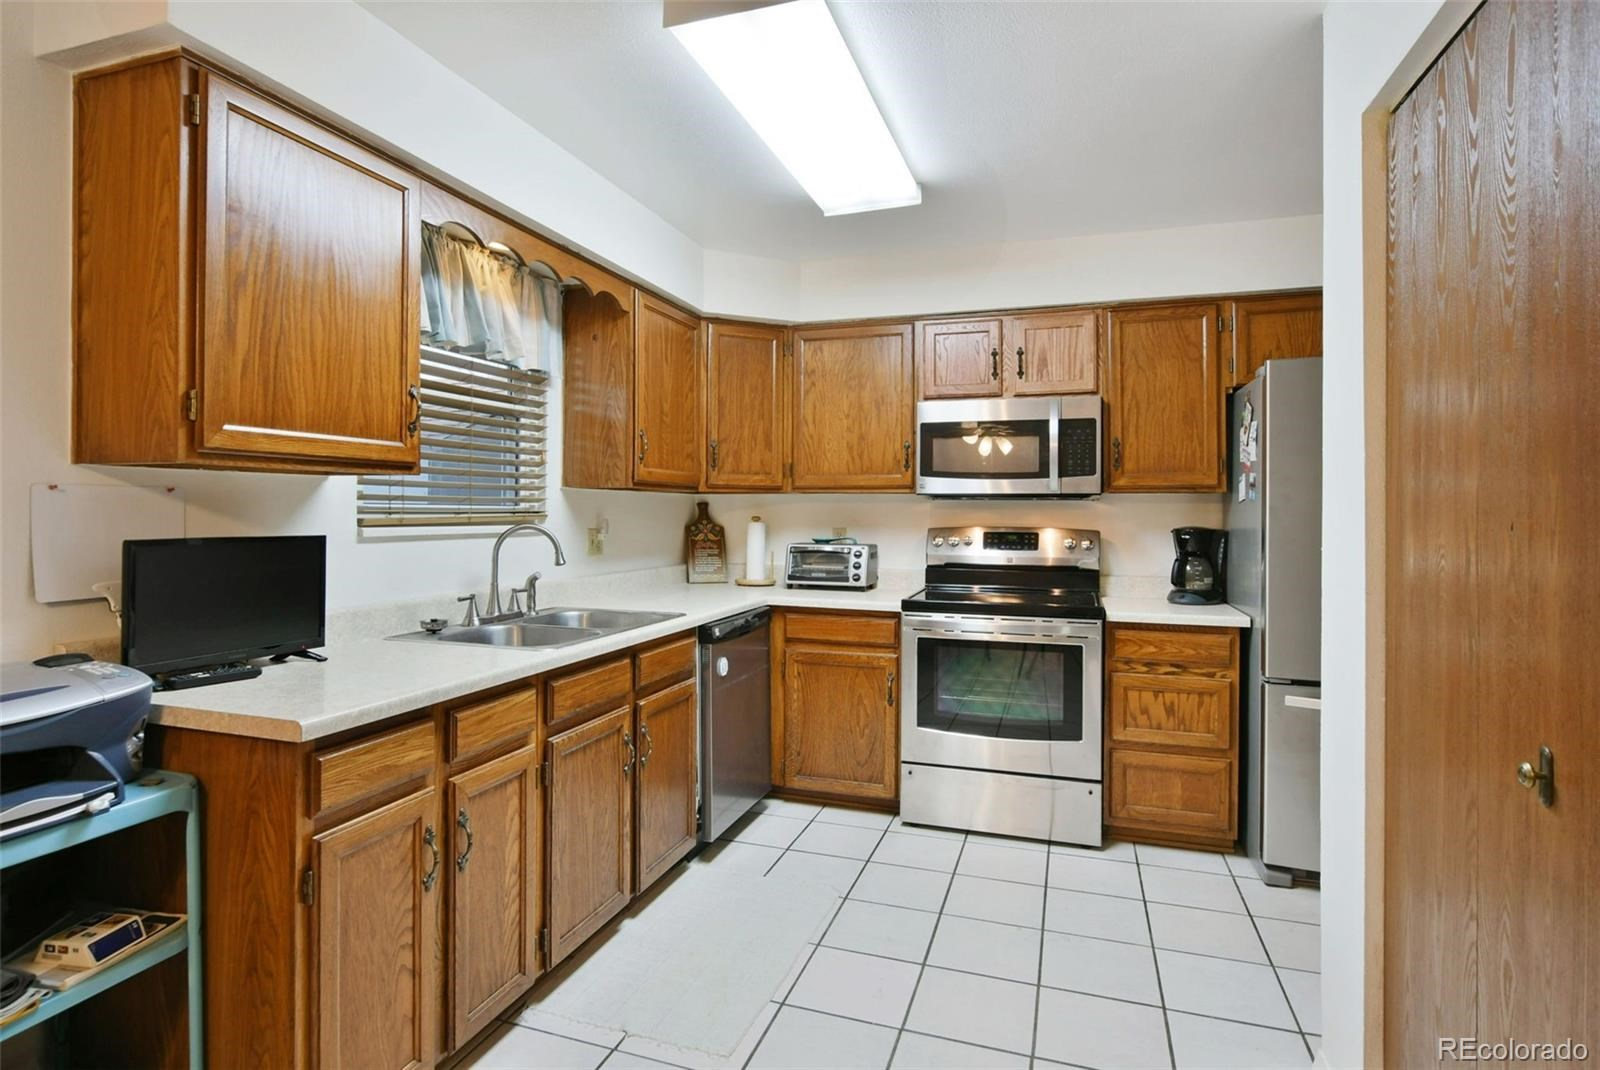 MLS# 9707677 - 8 - 712 Gardenia Street, Golden, CO 80401